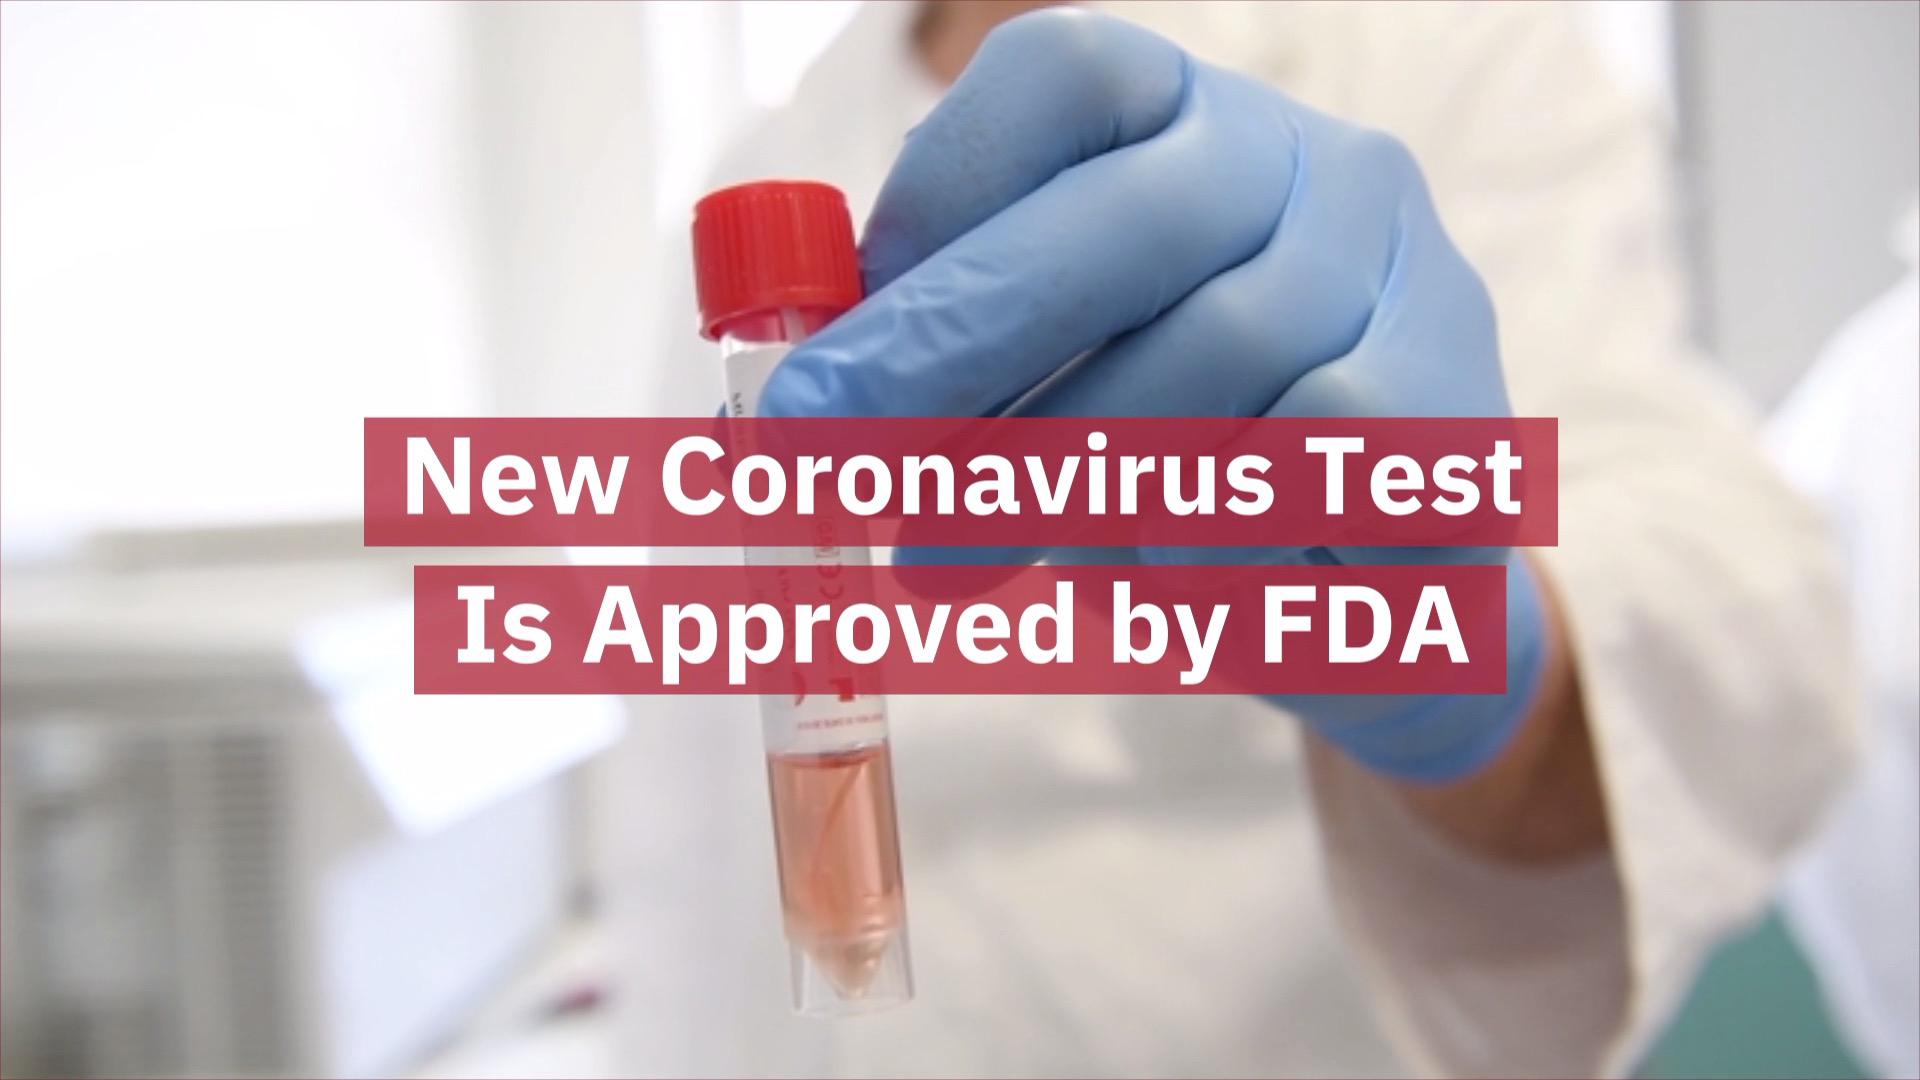 A New Coronavirus Test